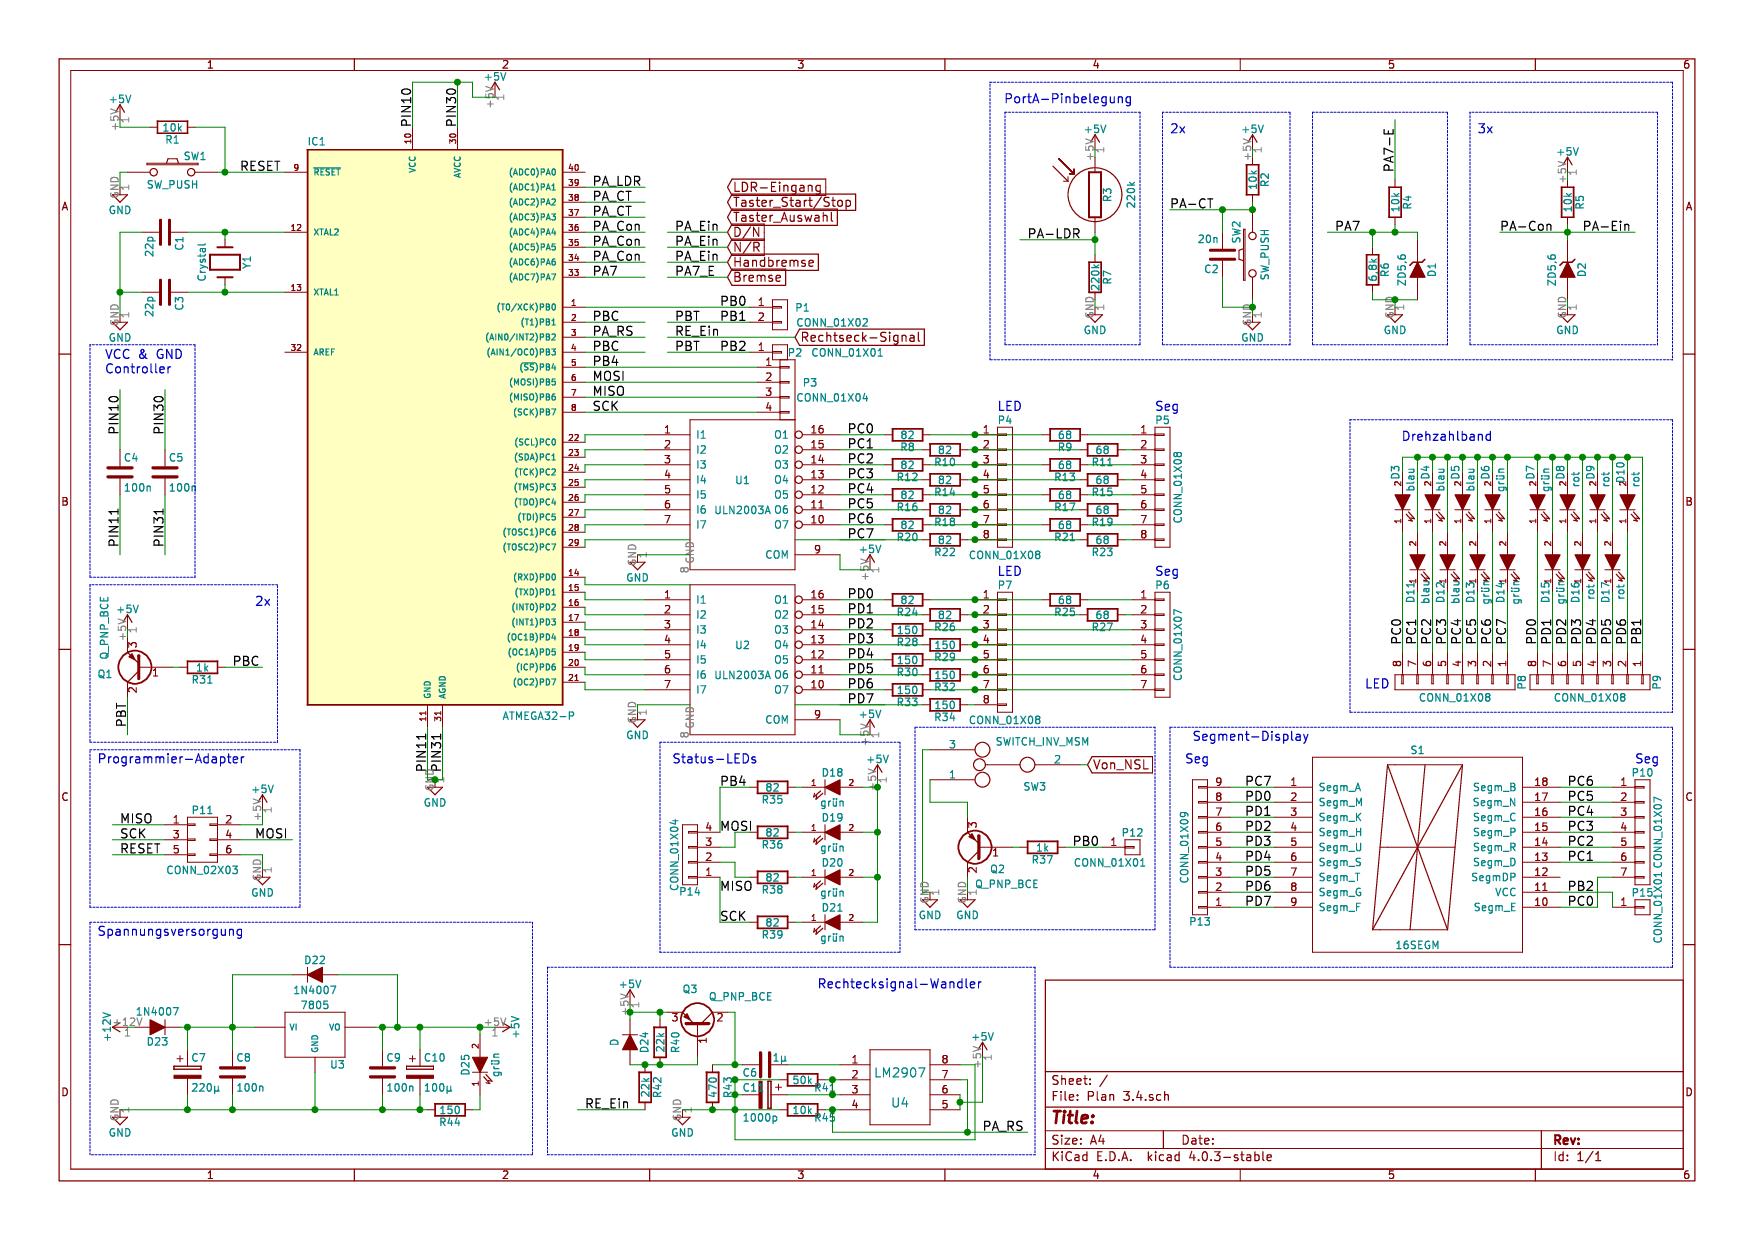 ATmega-Programmierer gesucht - Mikrocontroller.net